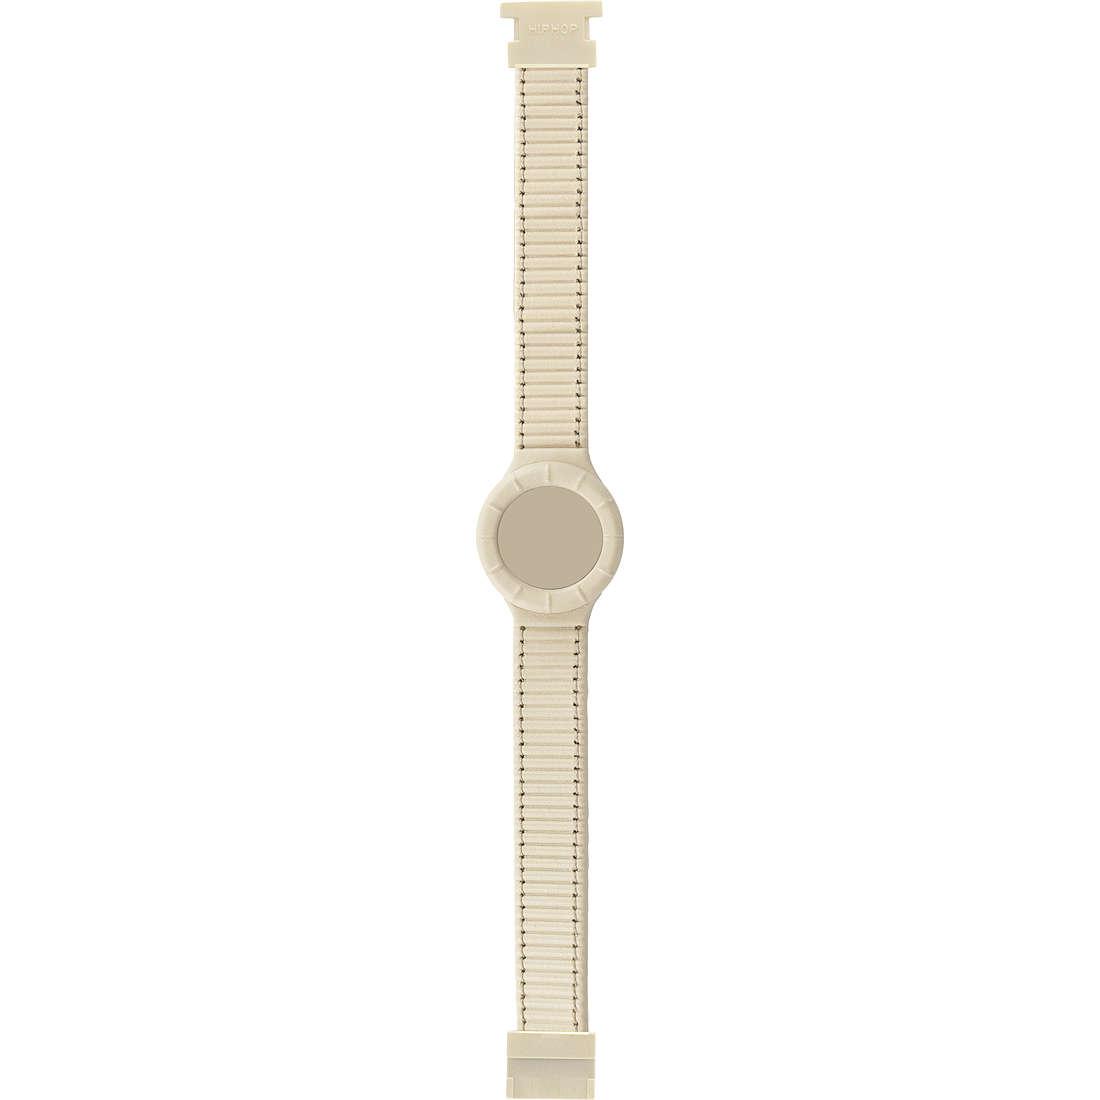 orologio cinturino orologio unisex Hip Hop Leather HBU0198